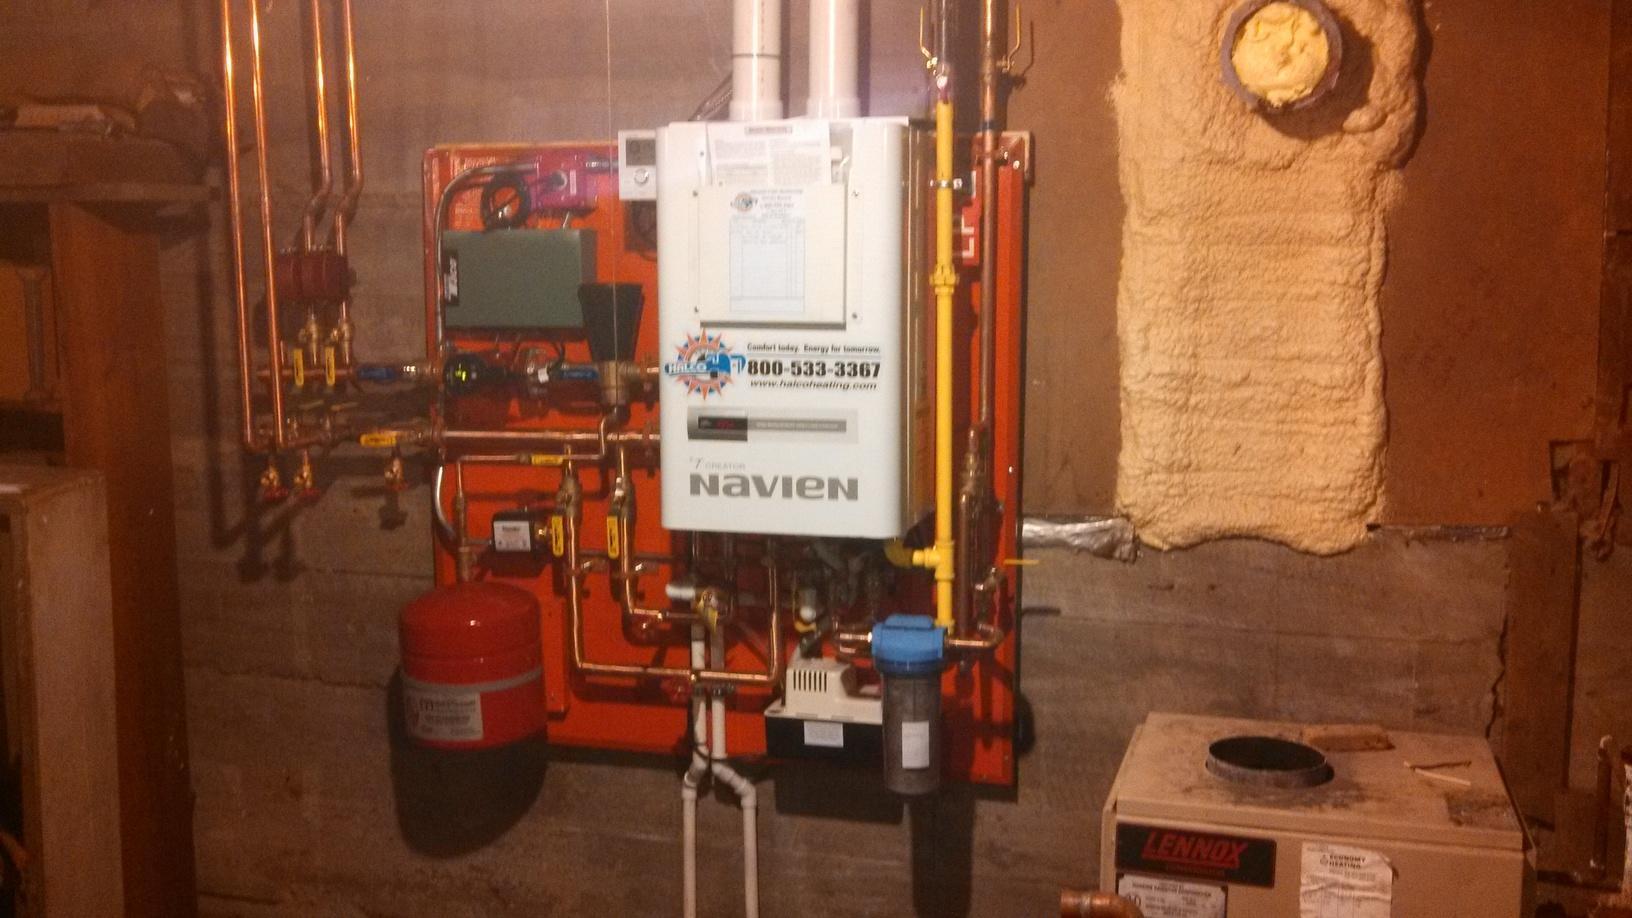 Navien Combi Boiler Installation in Glen Aubrey, NY